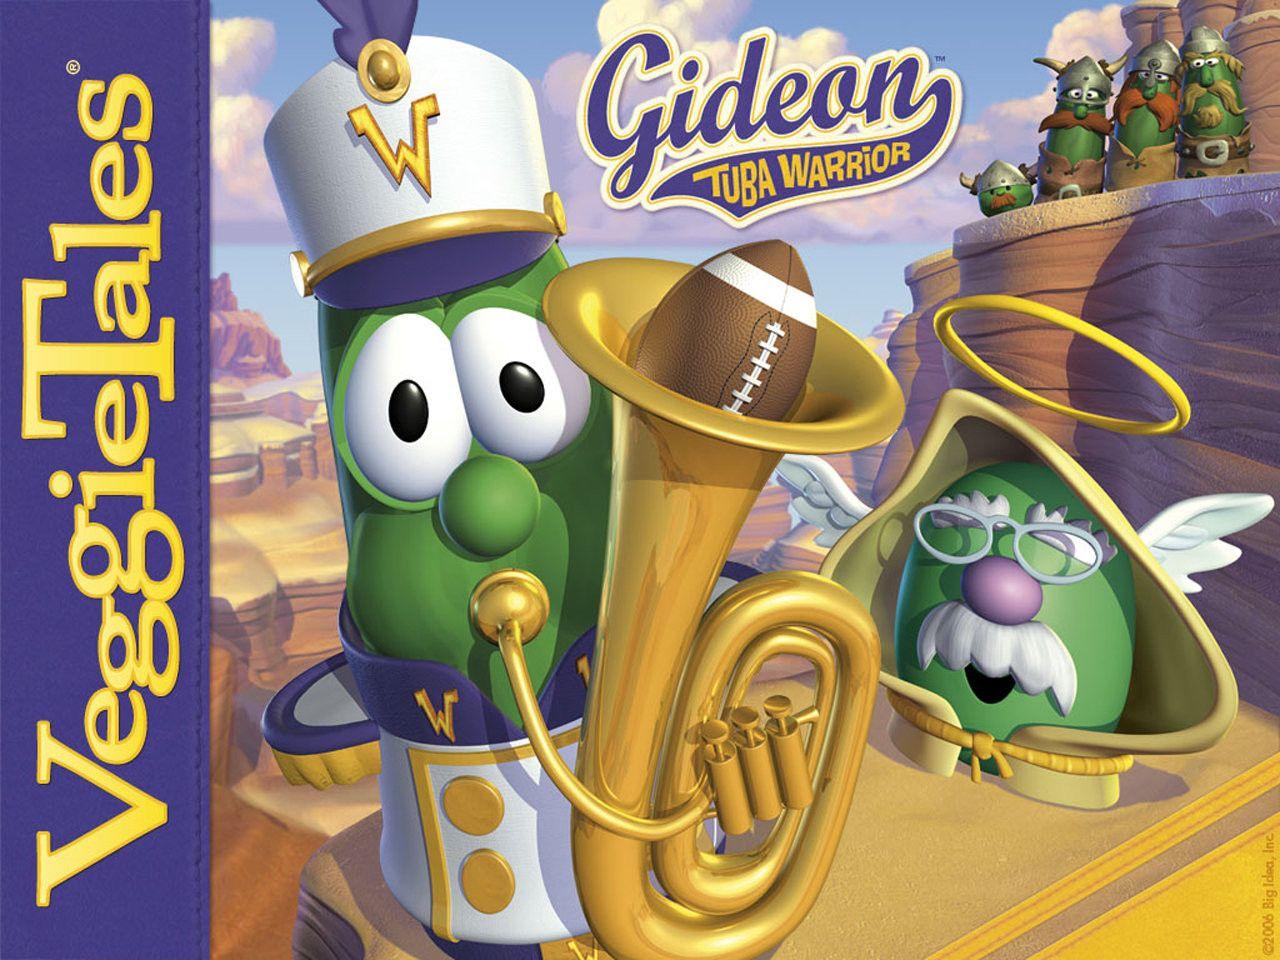 Gideon tuba warrior veggietales sing along songs tuba